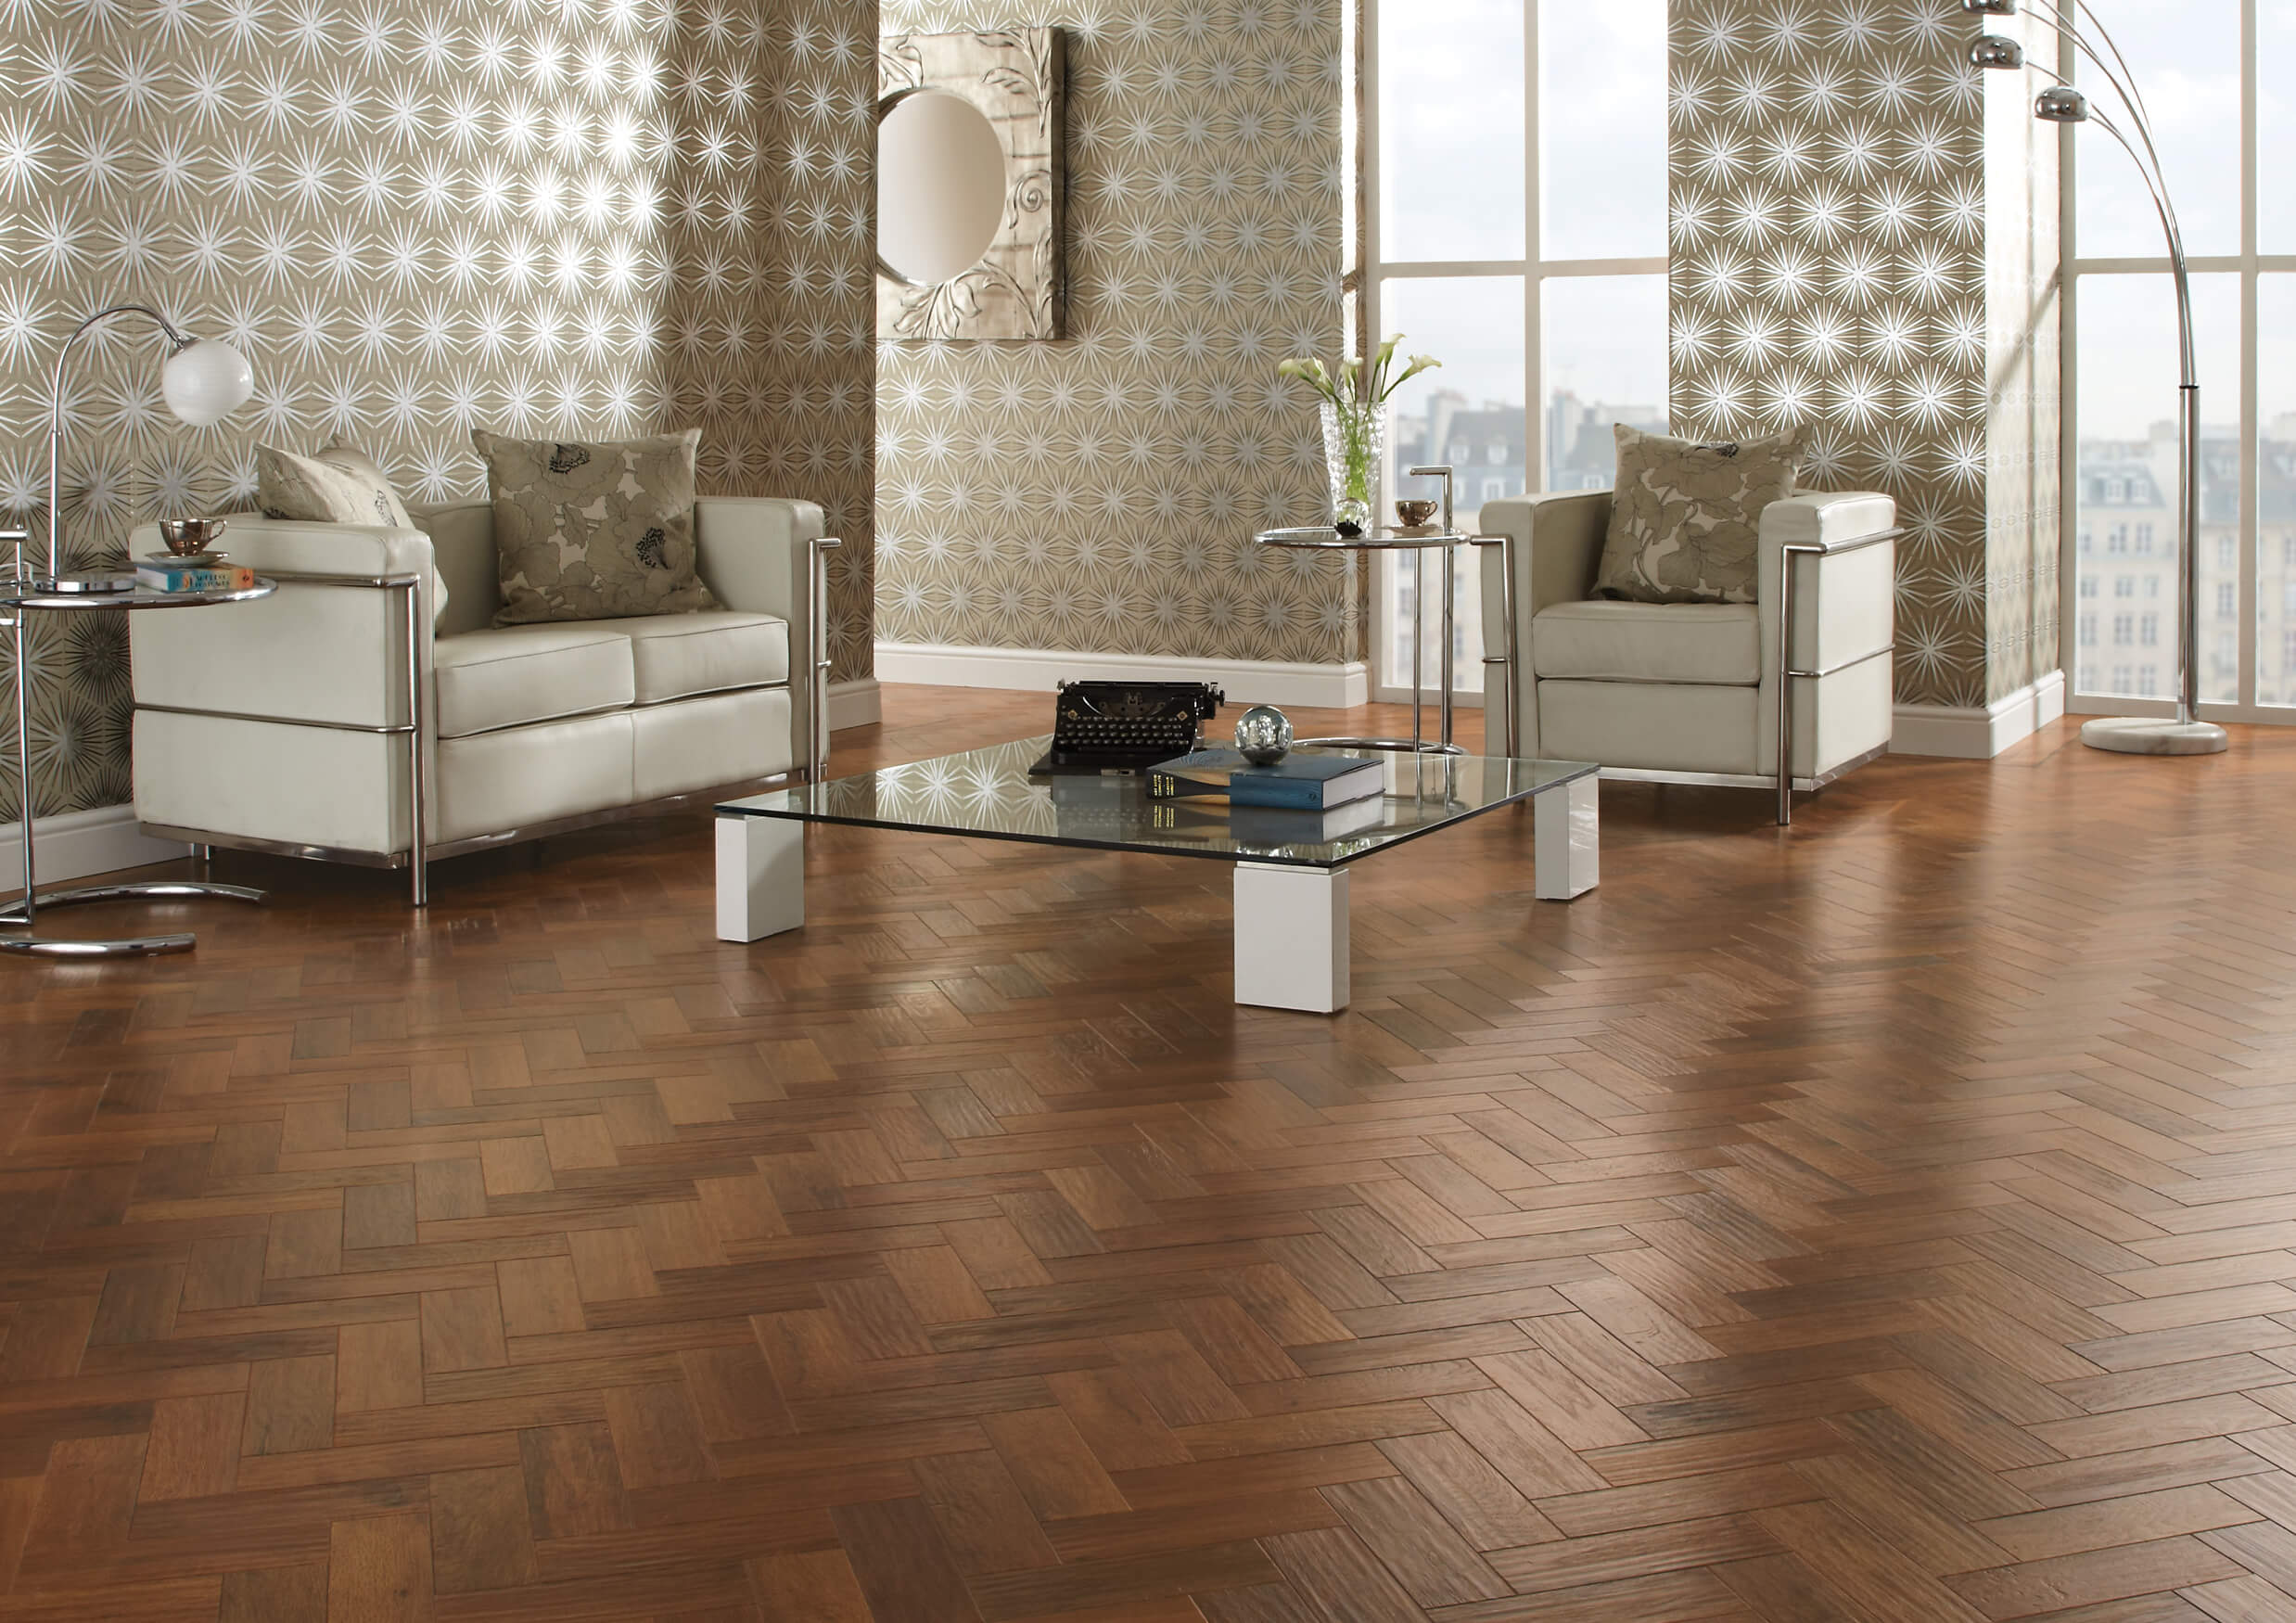 Karndean art select vinyl flooring in auburn oak ap02 for Parquet flooring